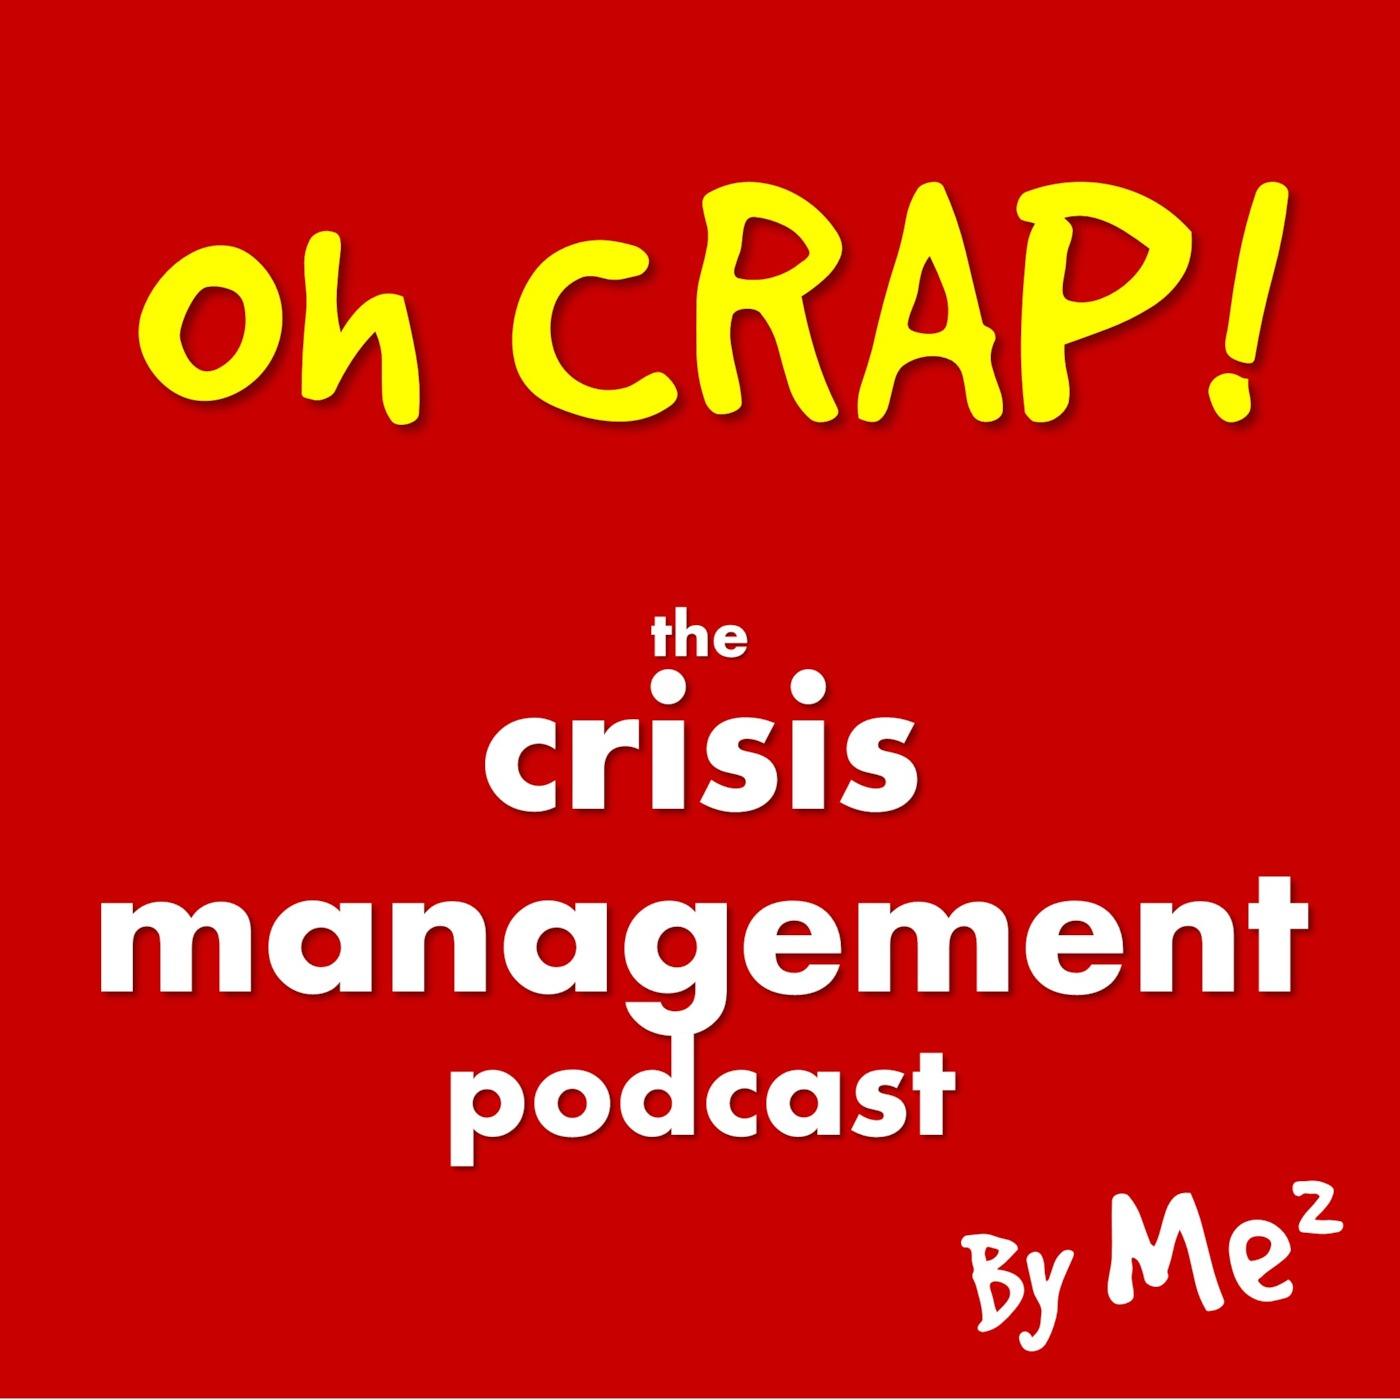 Oh Crap! The Crisis Management Podcast